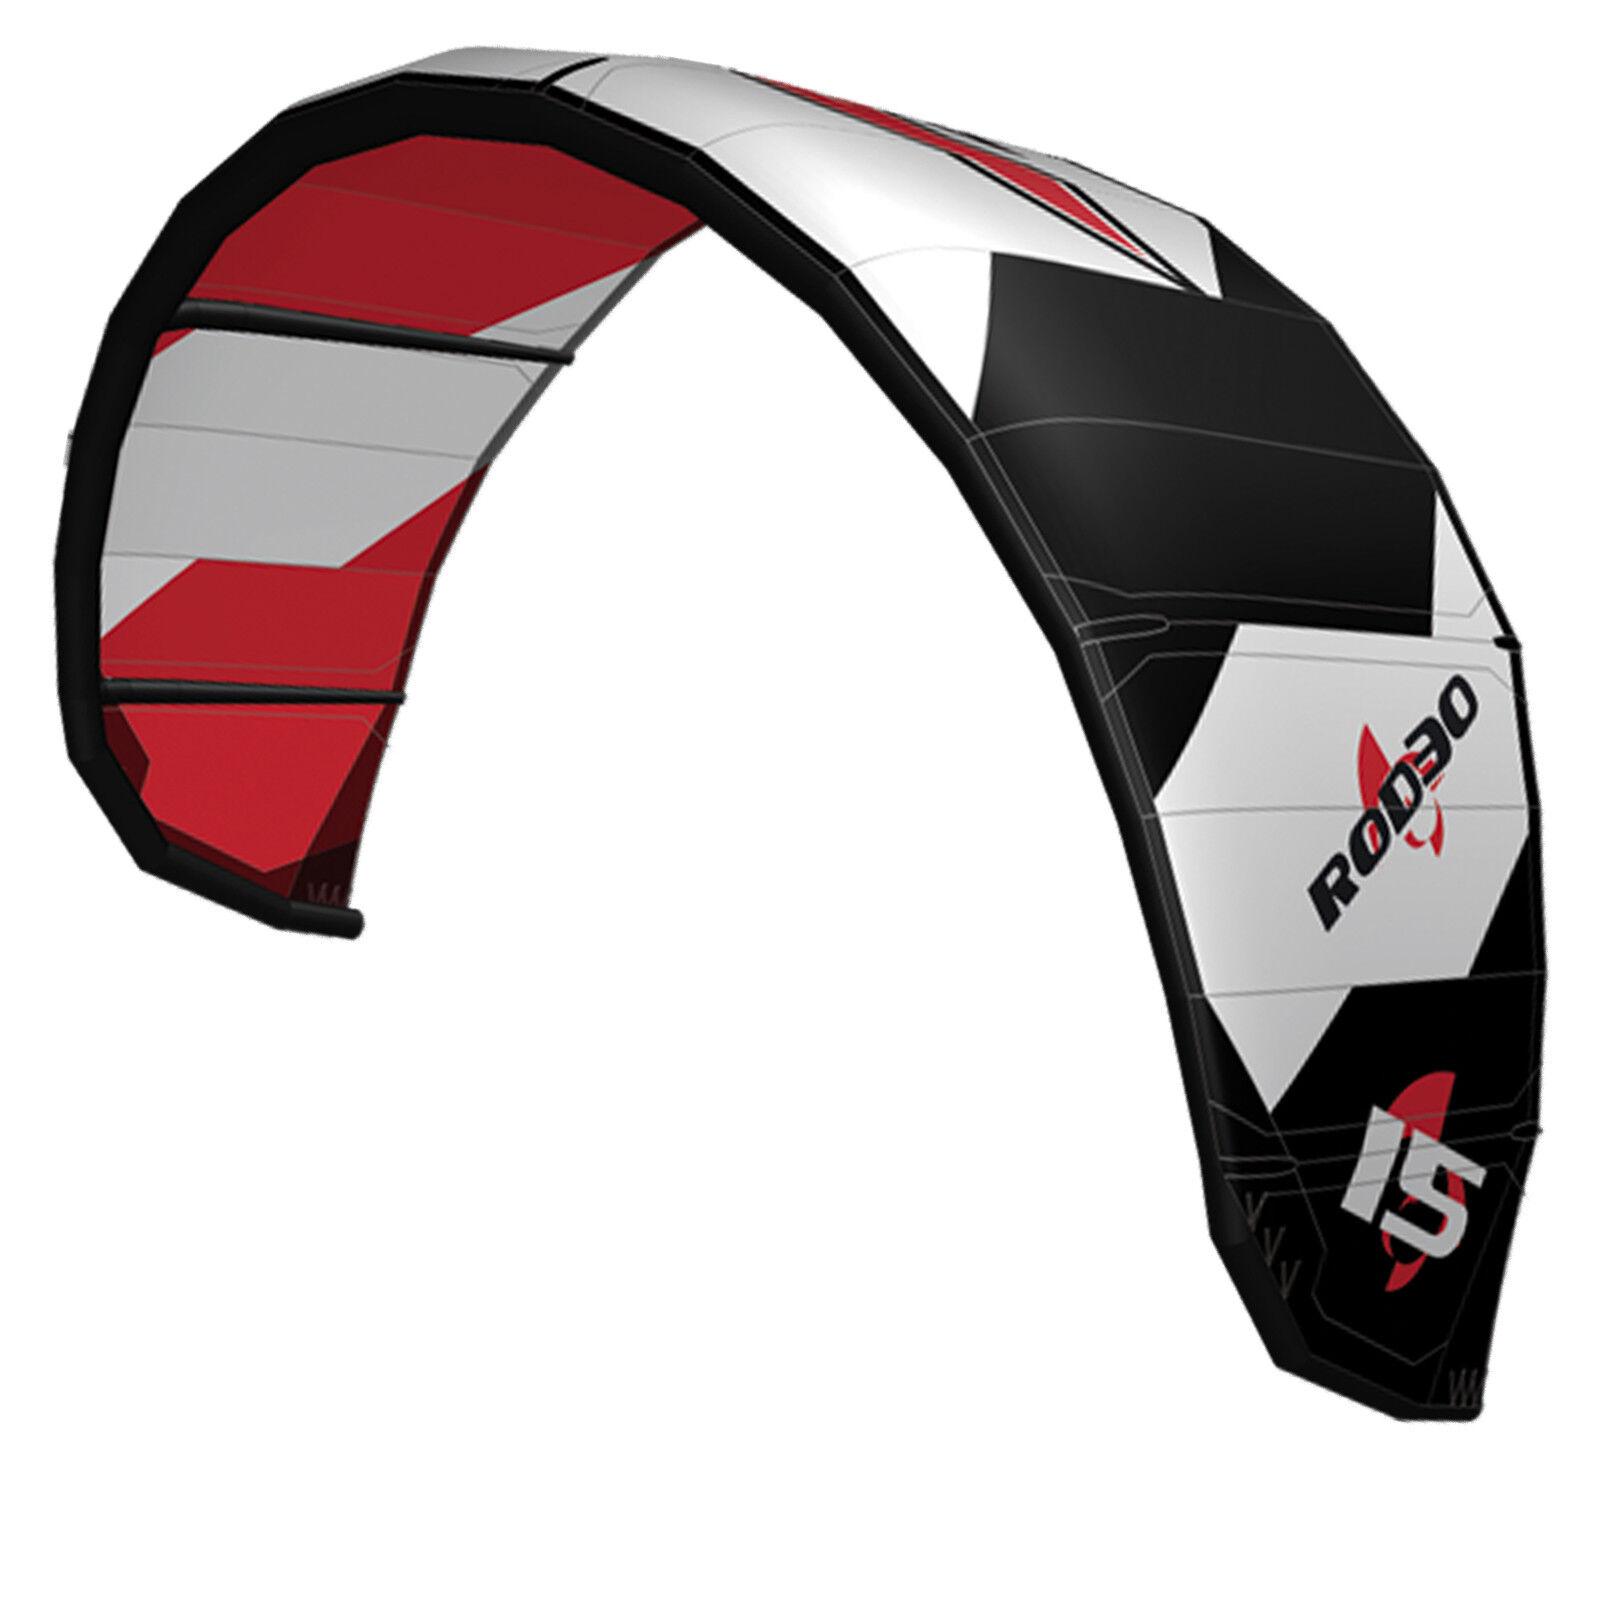 F2 Rodeo Kite  15 M ²  New School Wave Freestyle C-Kite